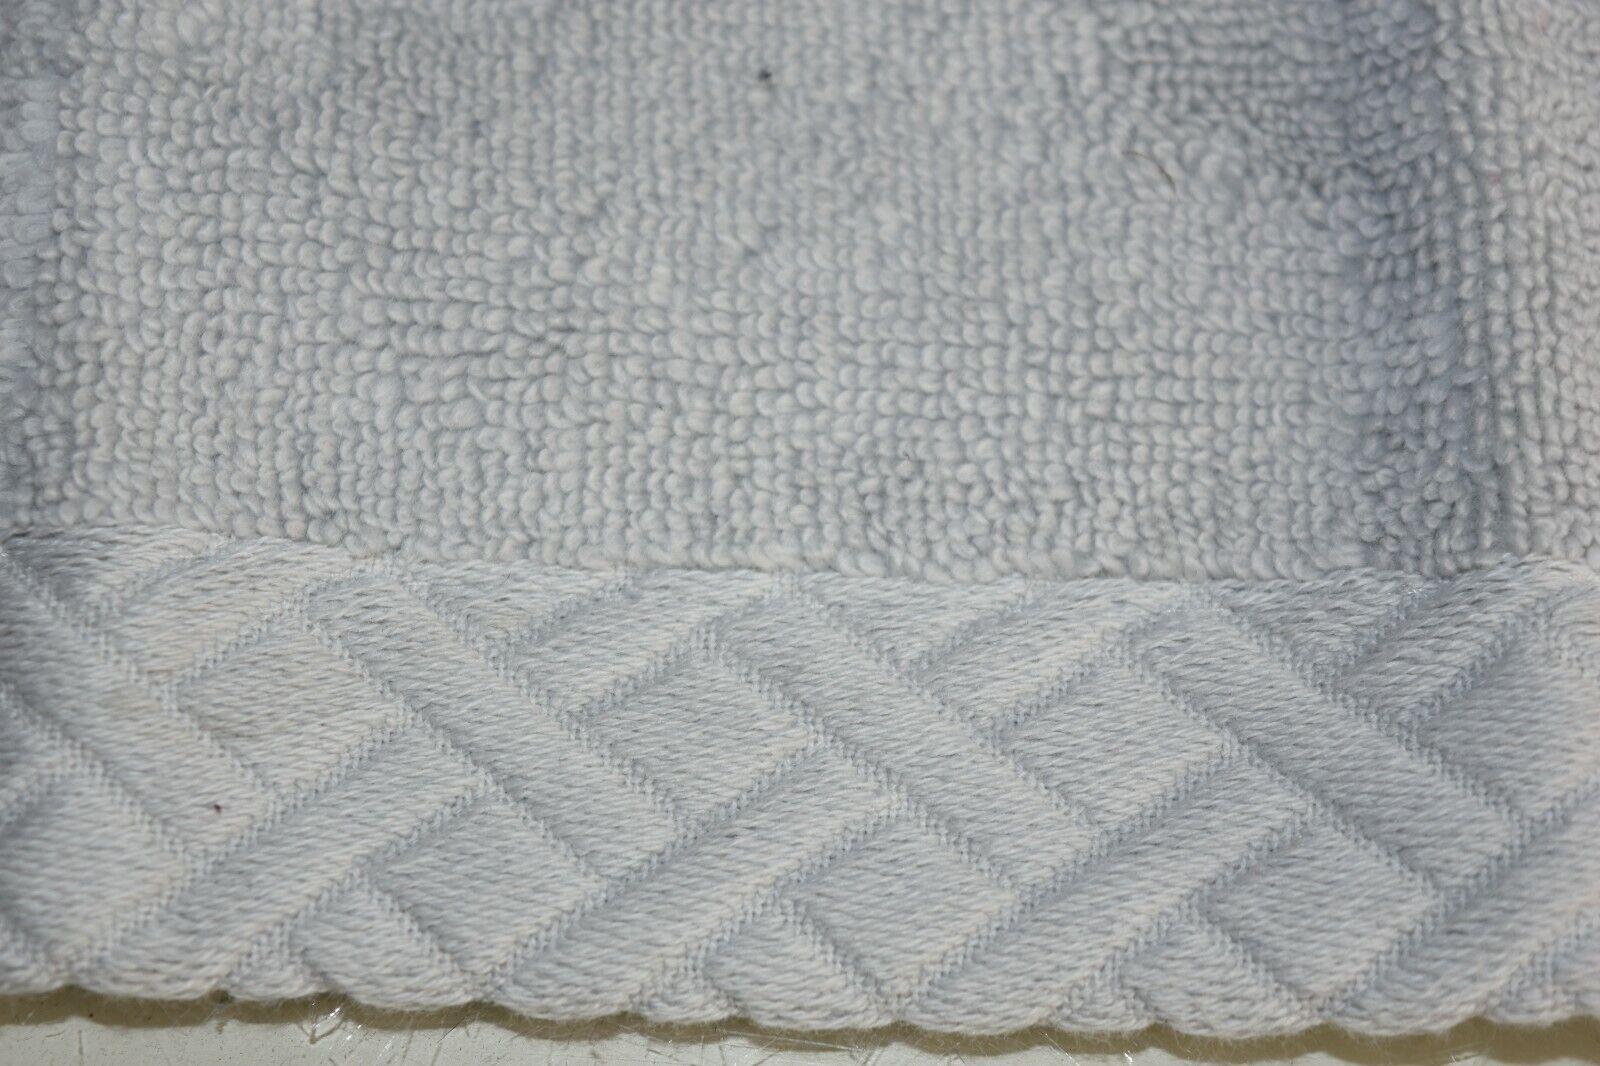 NEW 6 PC TOWEL SET 2 Bath 2 Hand 2 Washcloth SOFTEST LUXURIOUS Grey